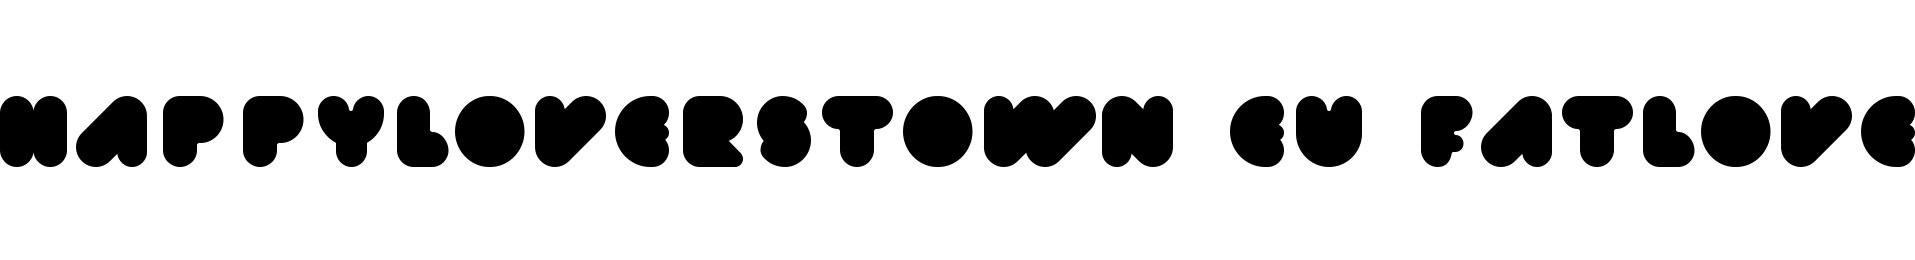 happyloverstown.eu_fatlove